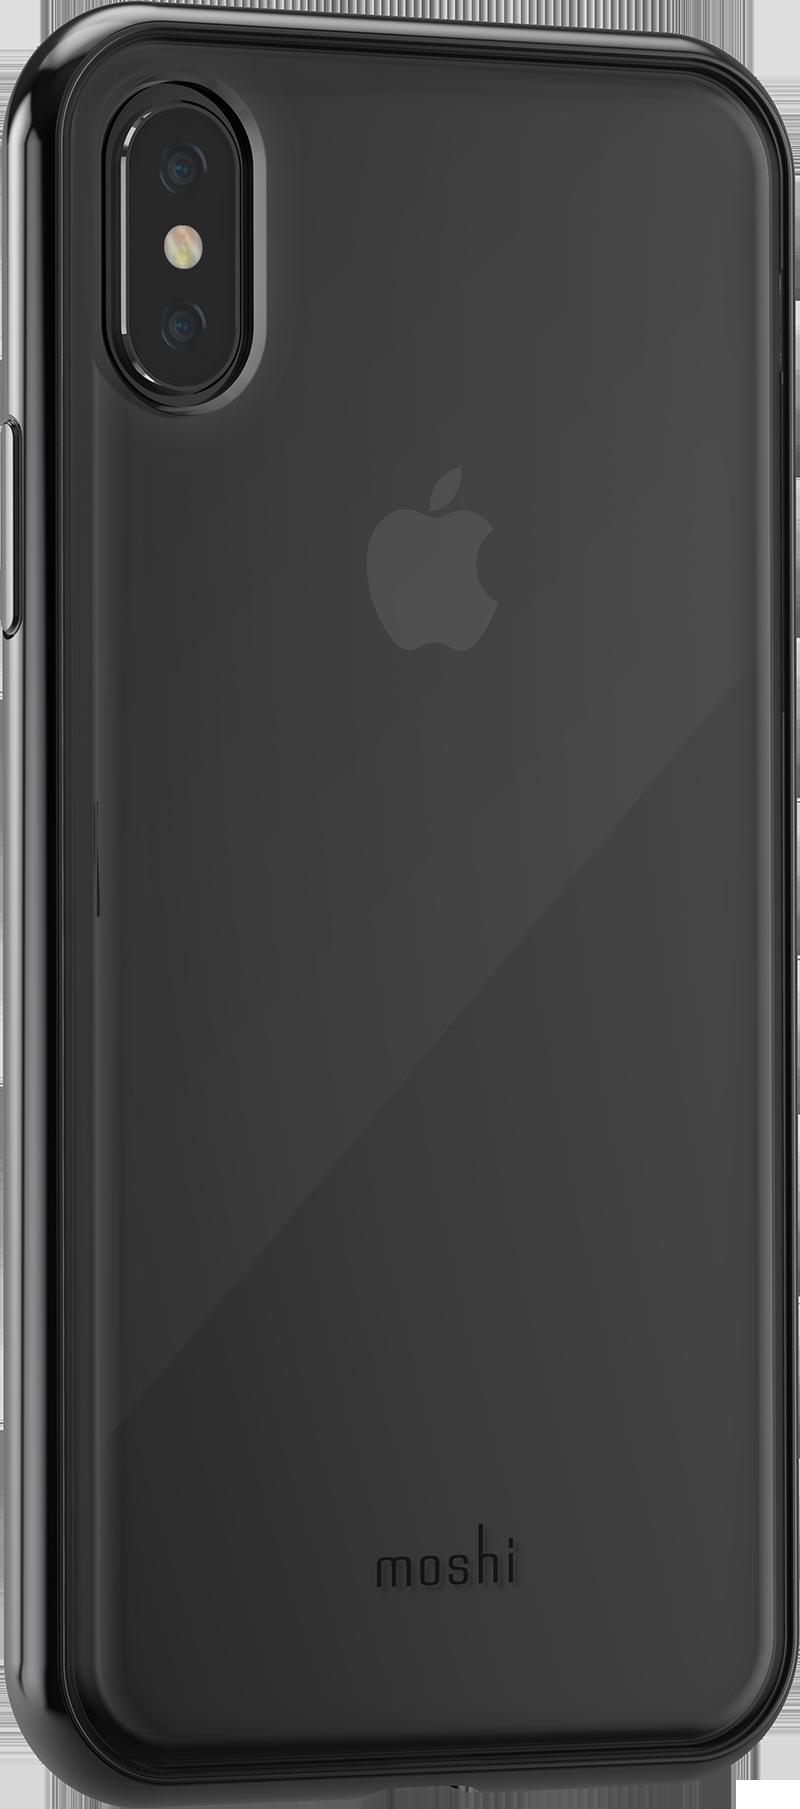 Coque vitros moshi iPhone X